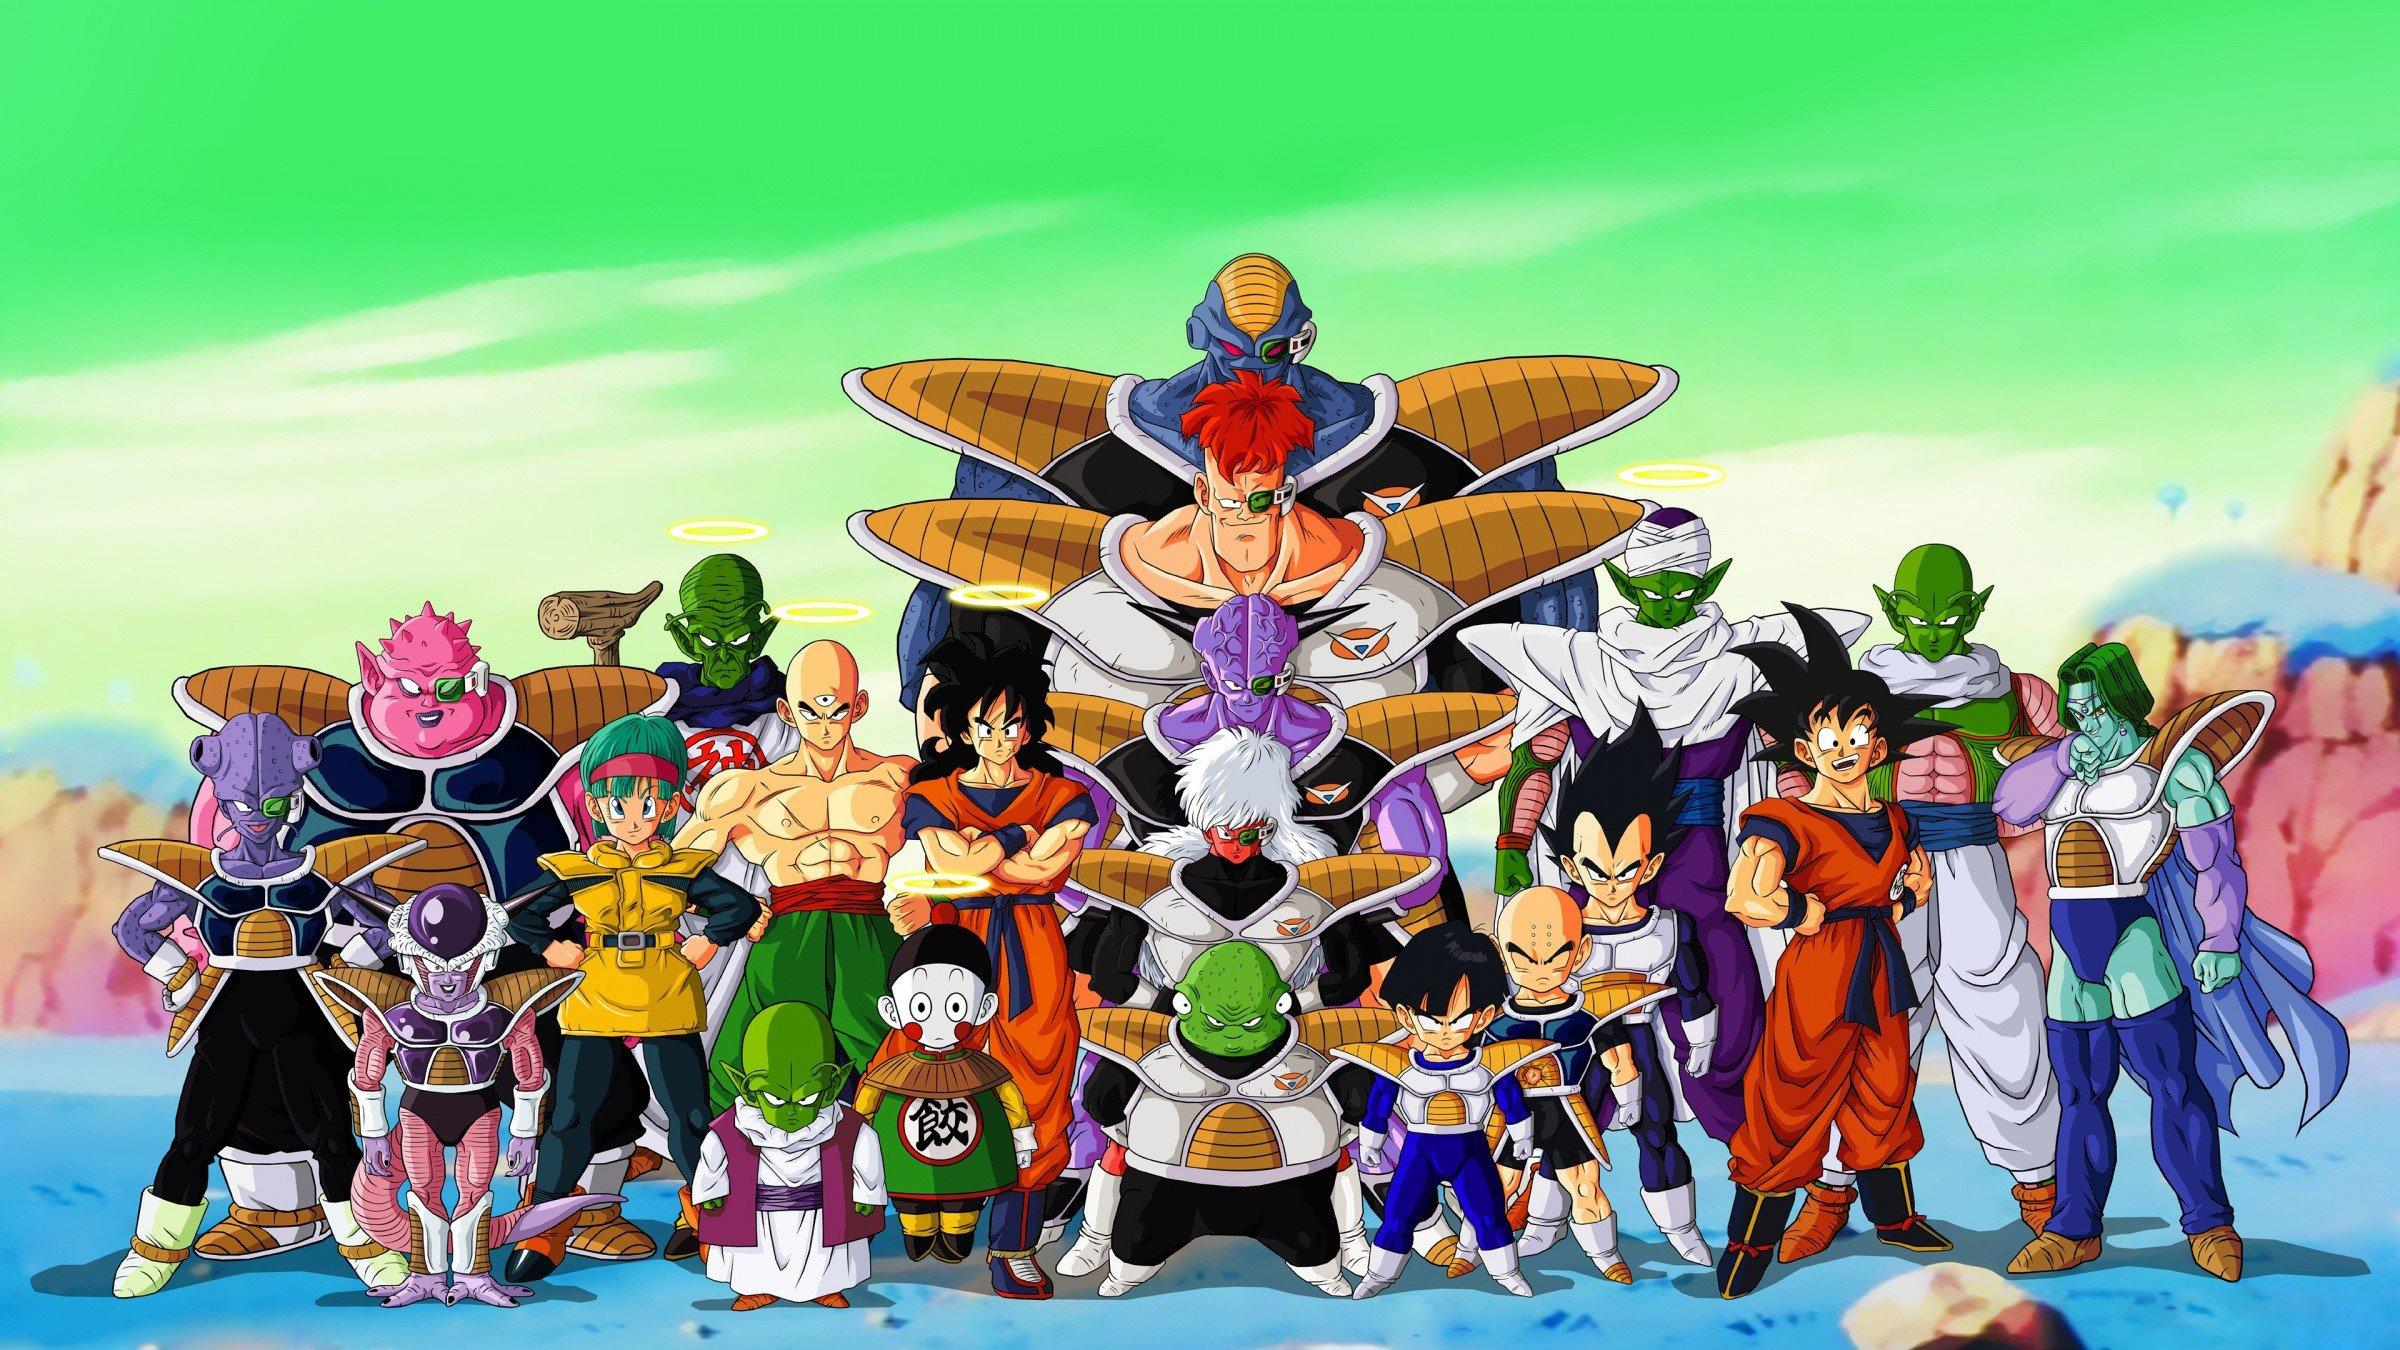 Wallpaper Personajes De Dragon Ball Z Images